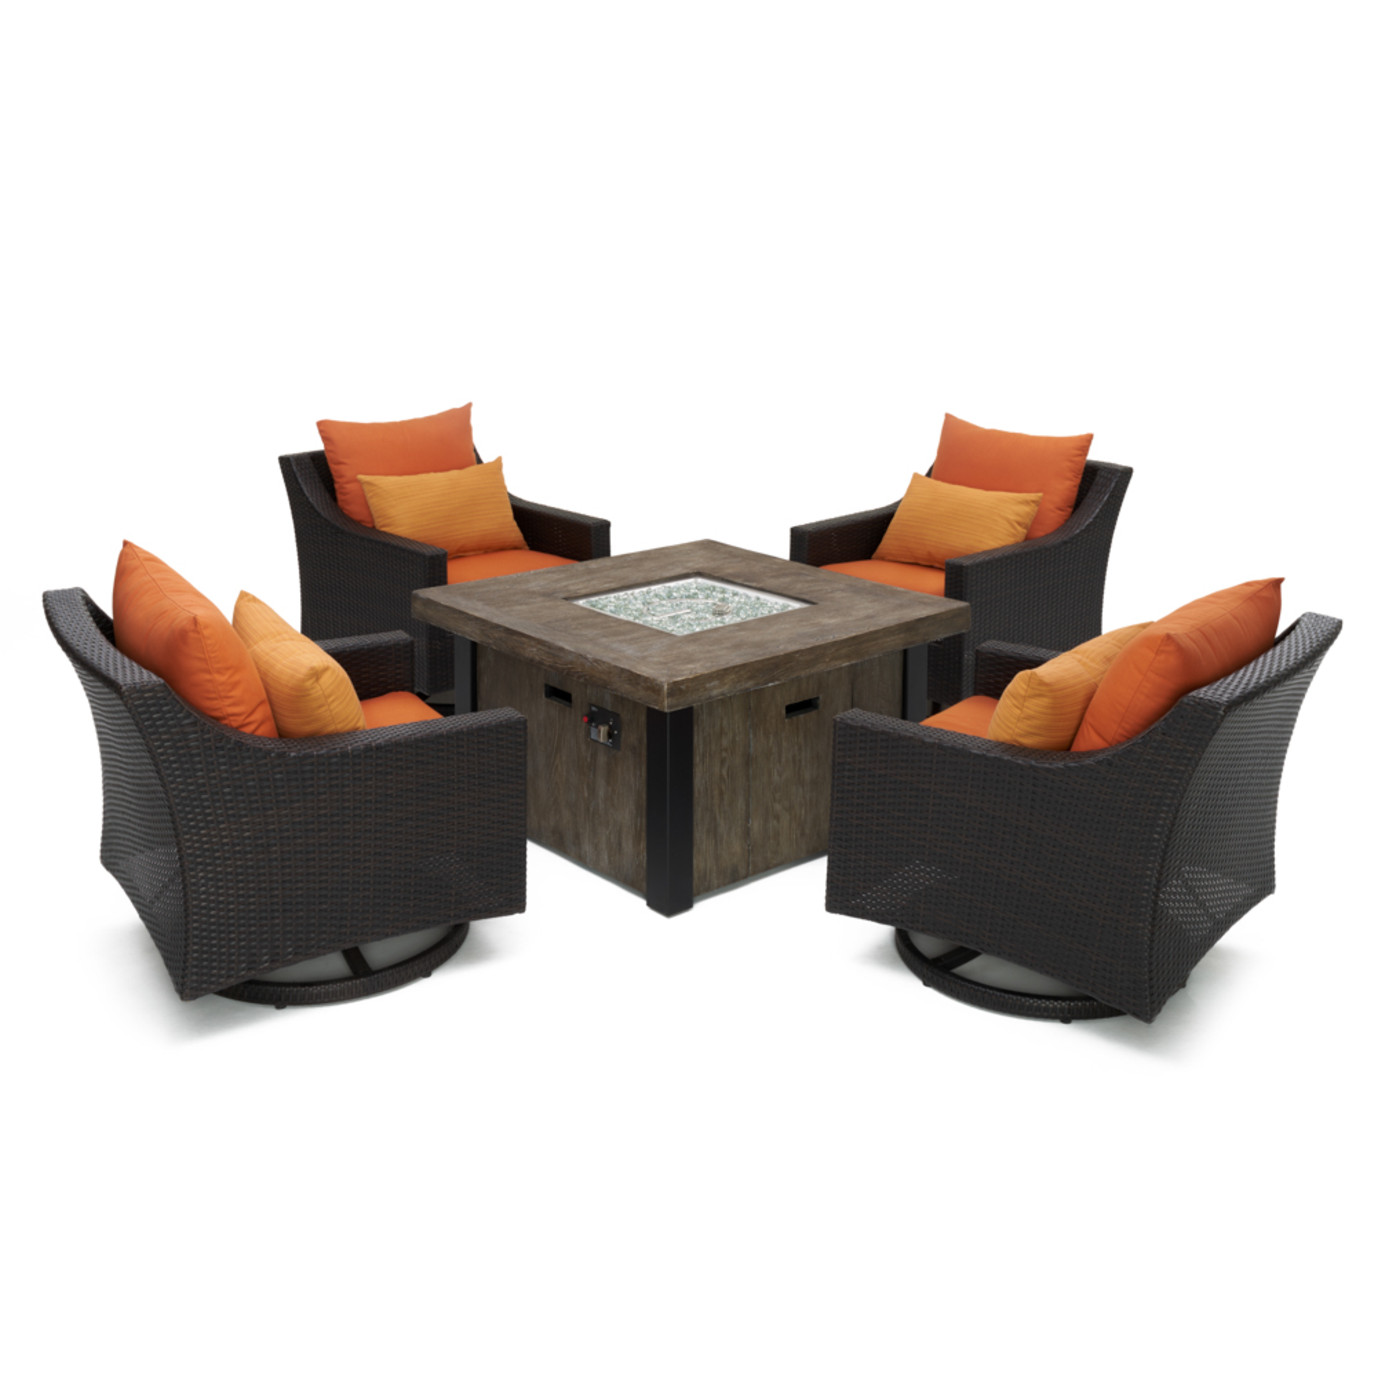 Deco™ 5pc Motion Fire Chat Set in Tikka Orange